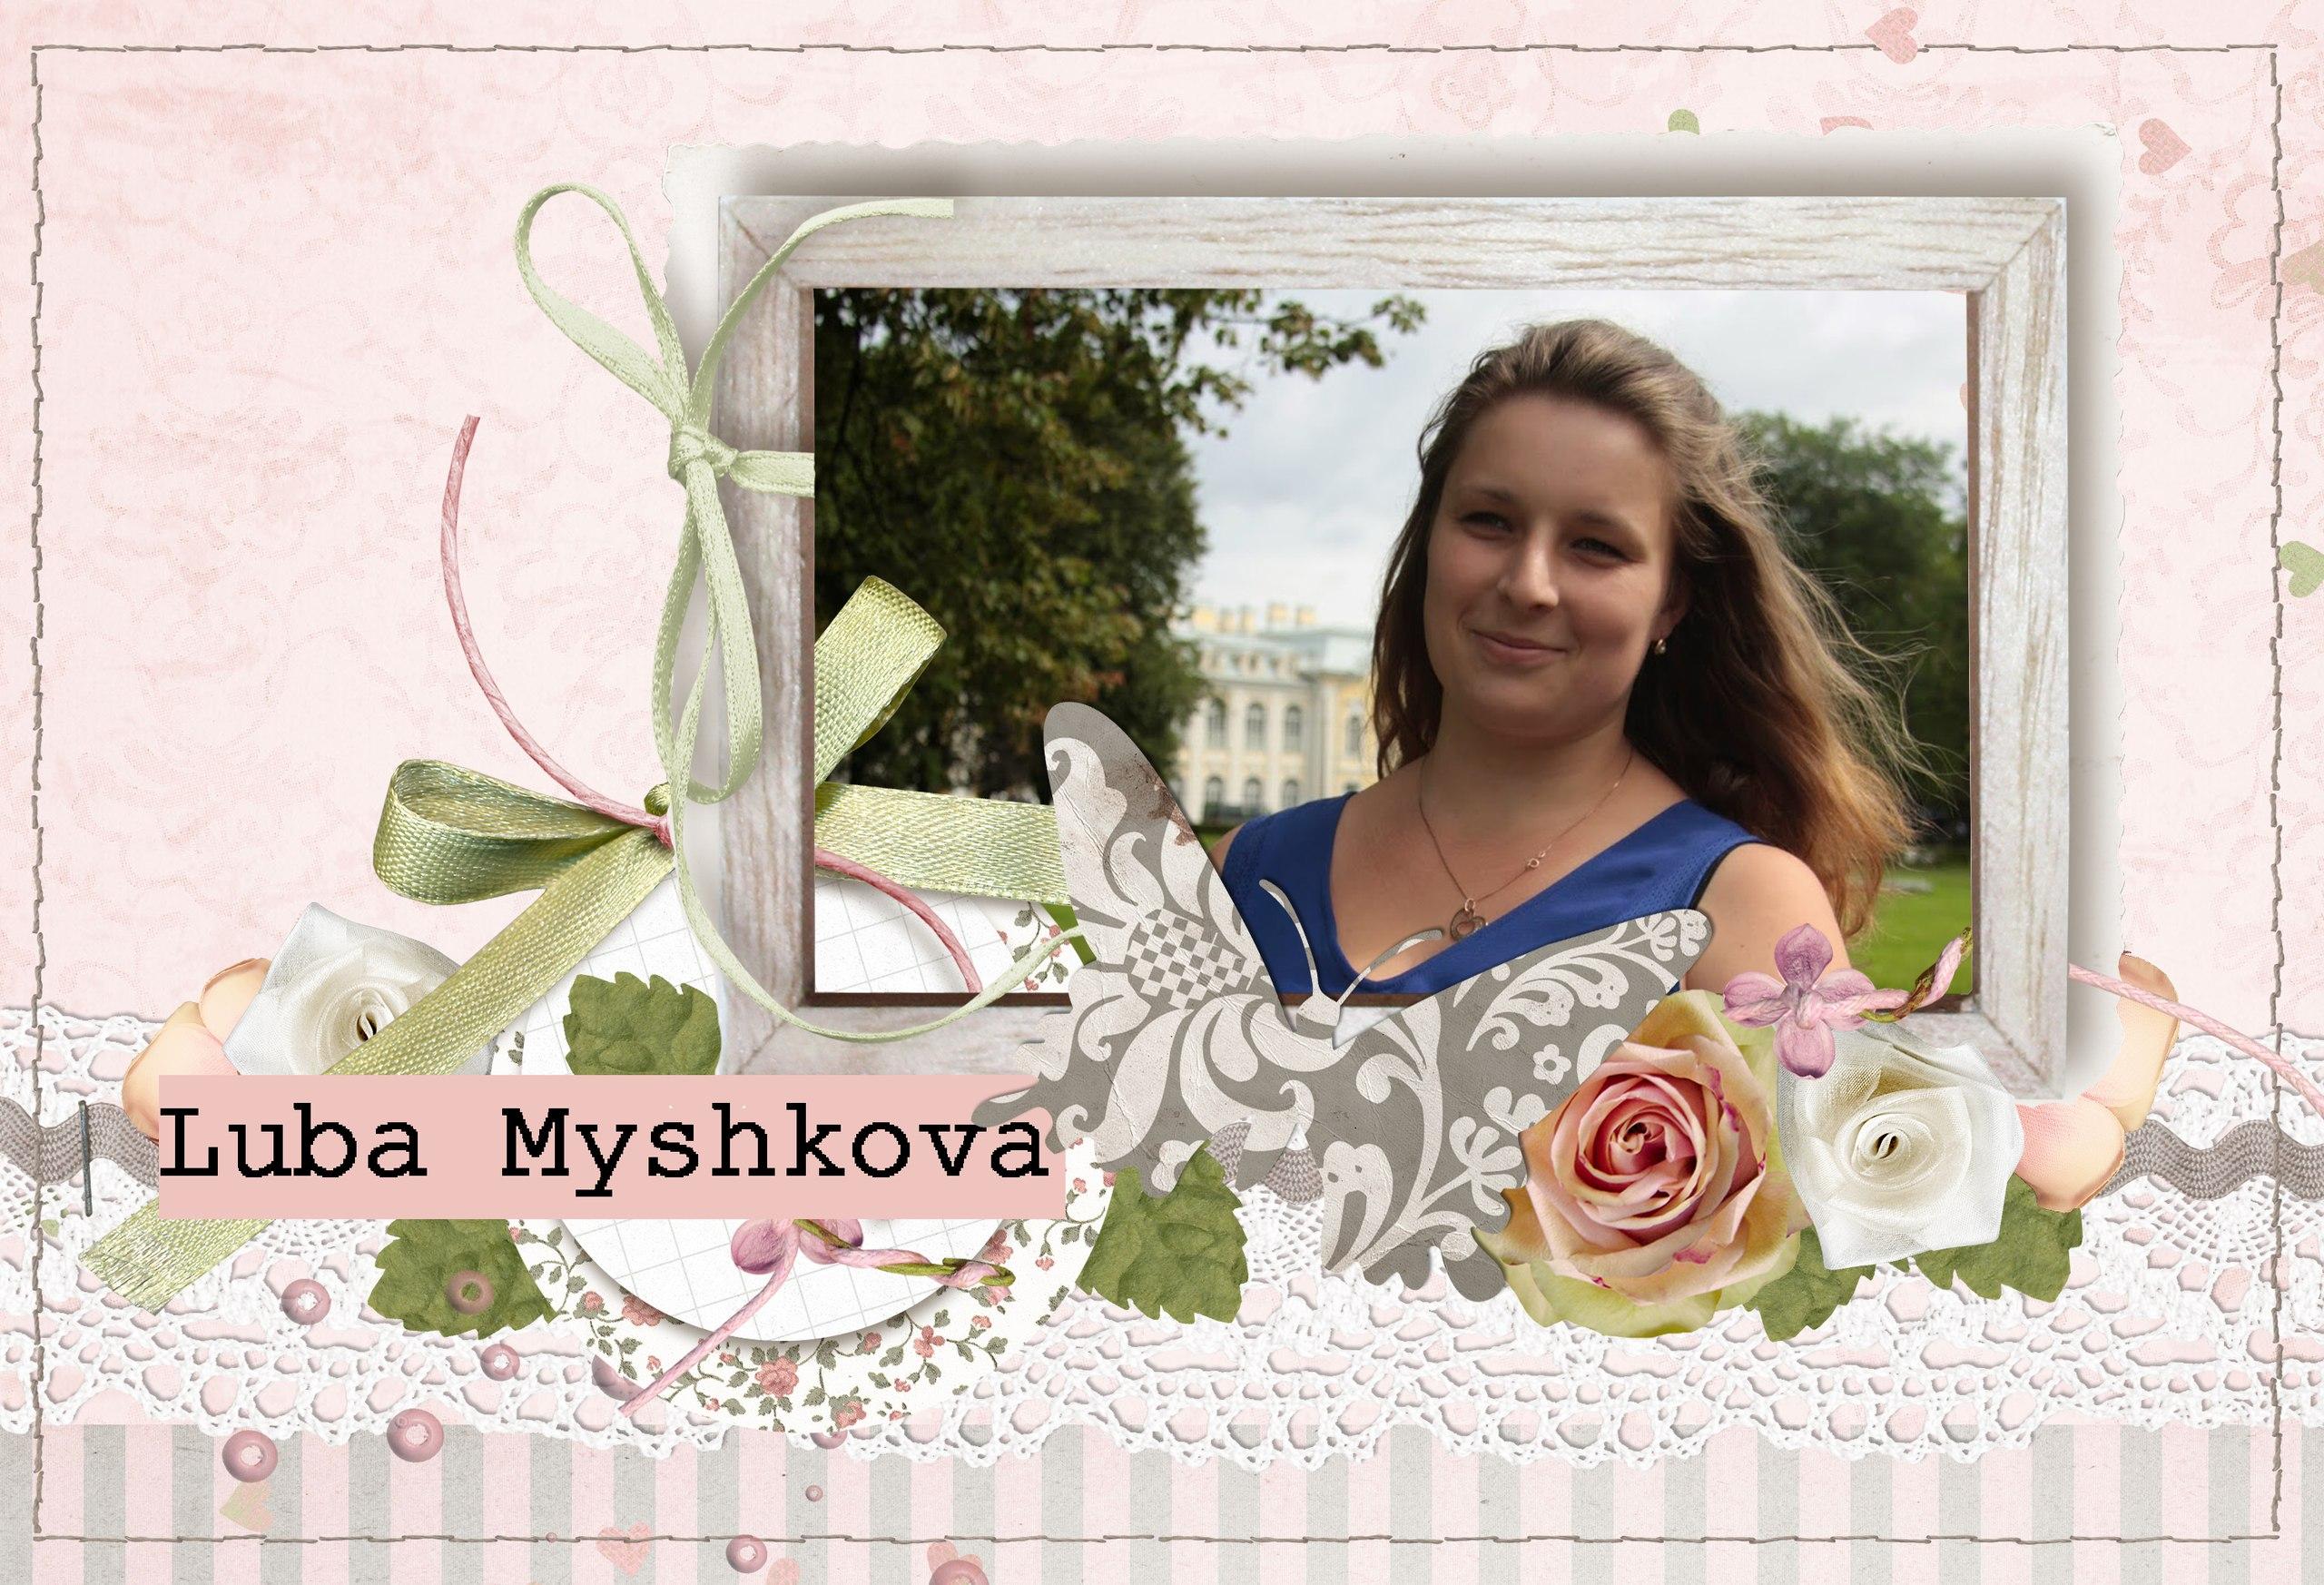 Luba Myshkova